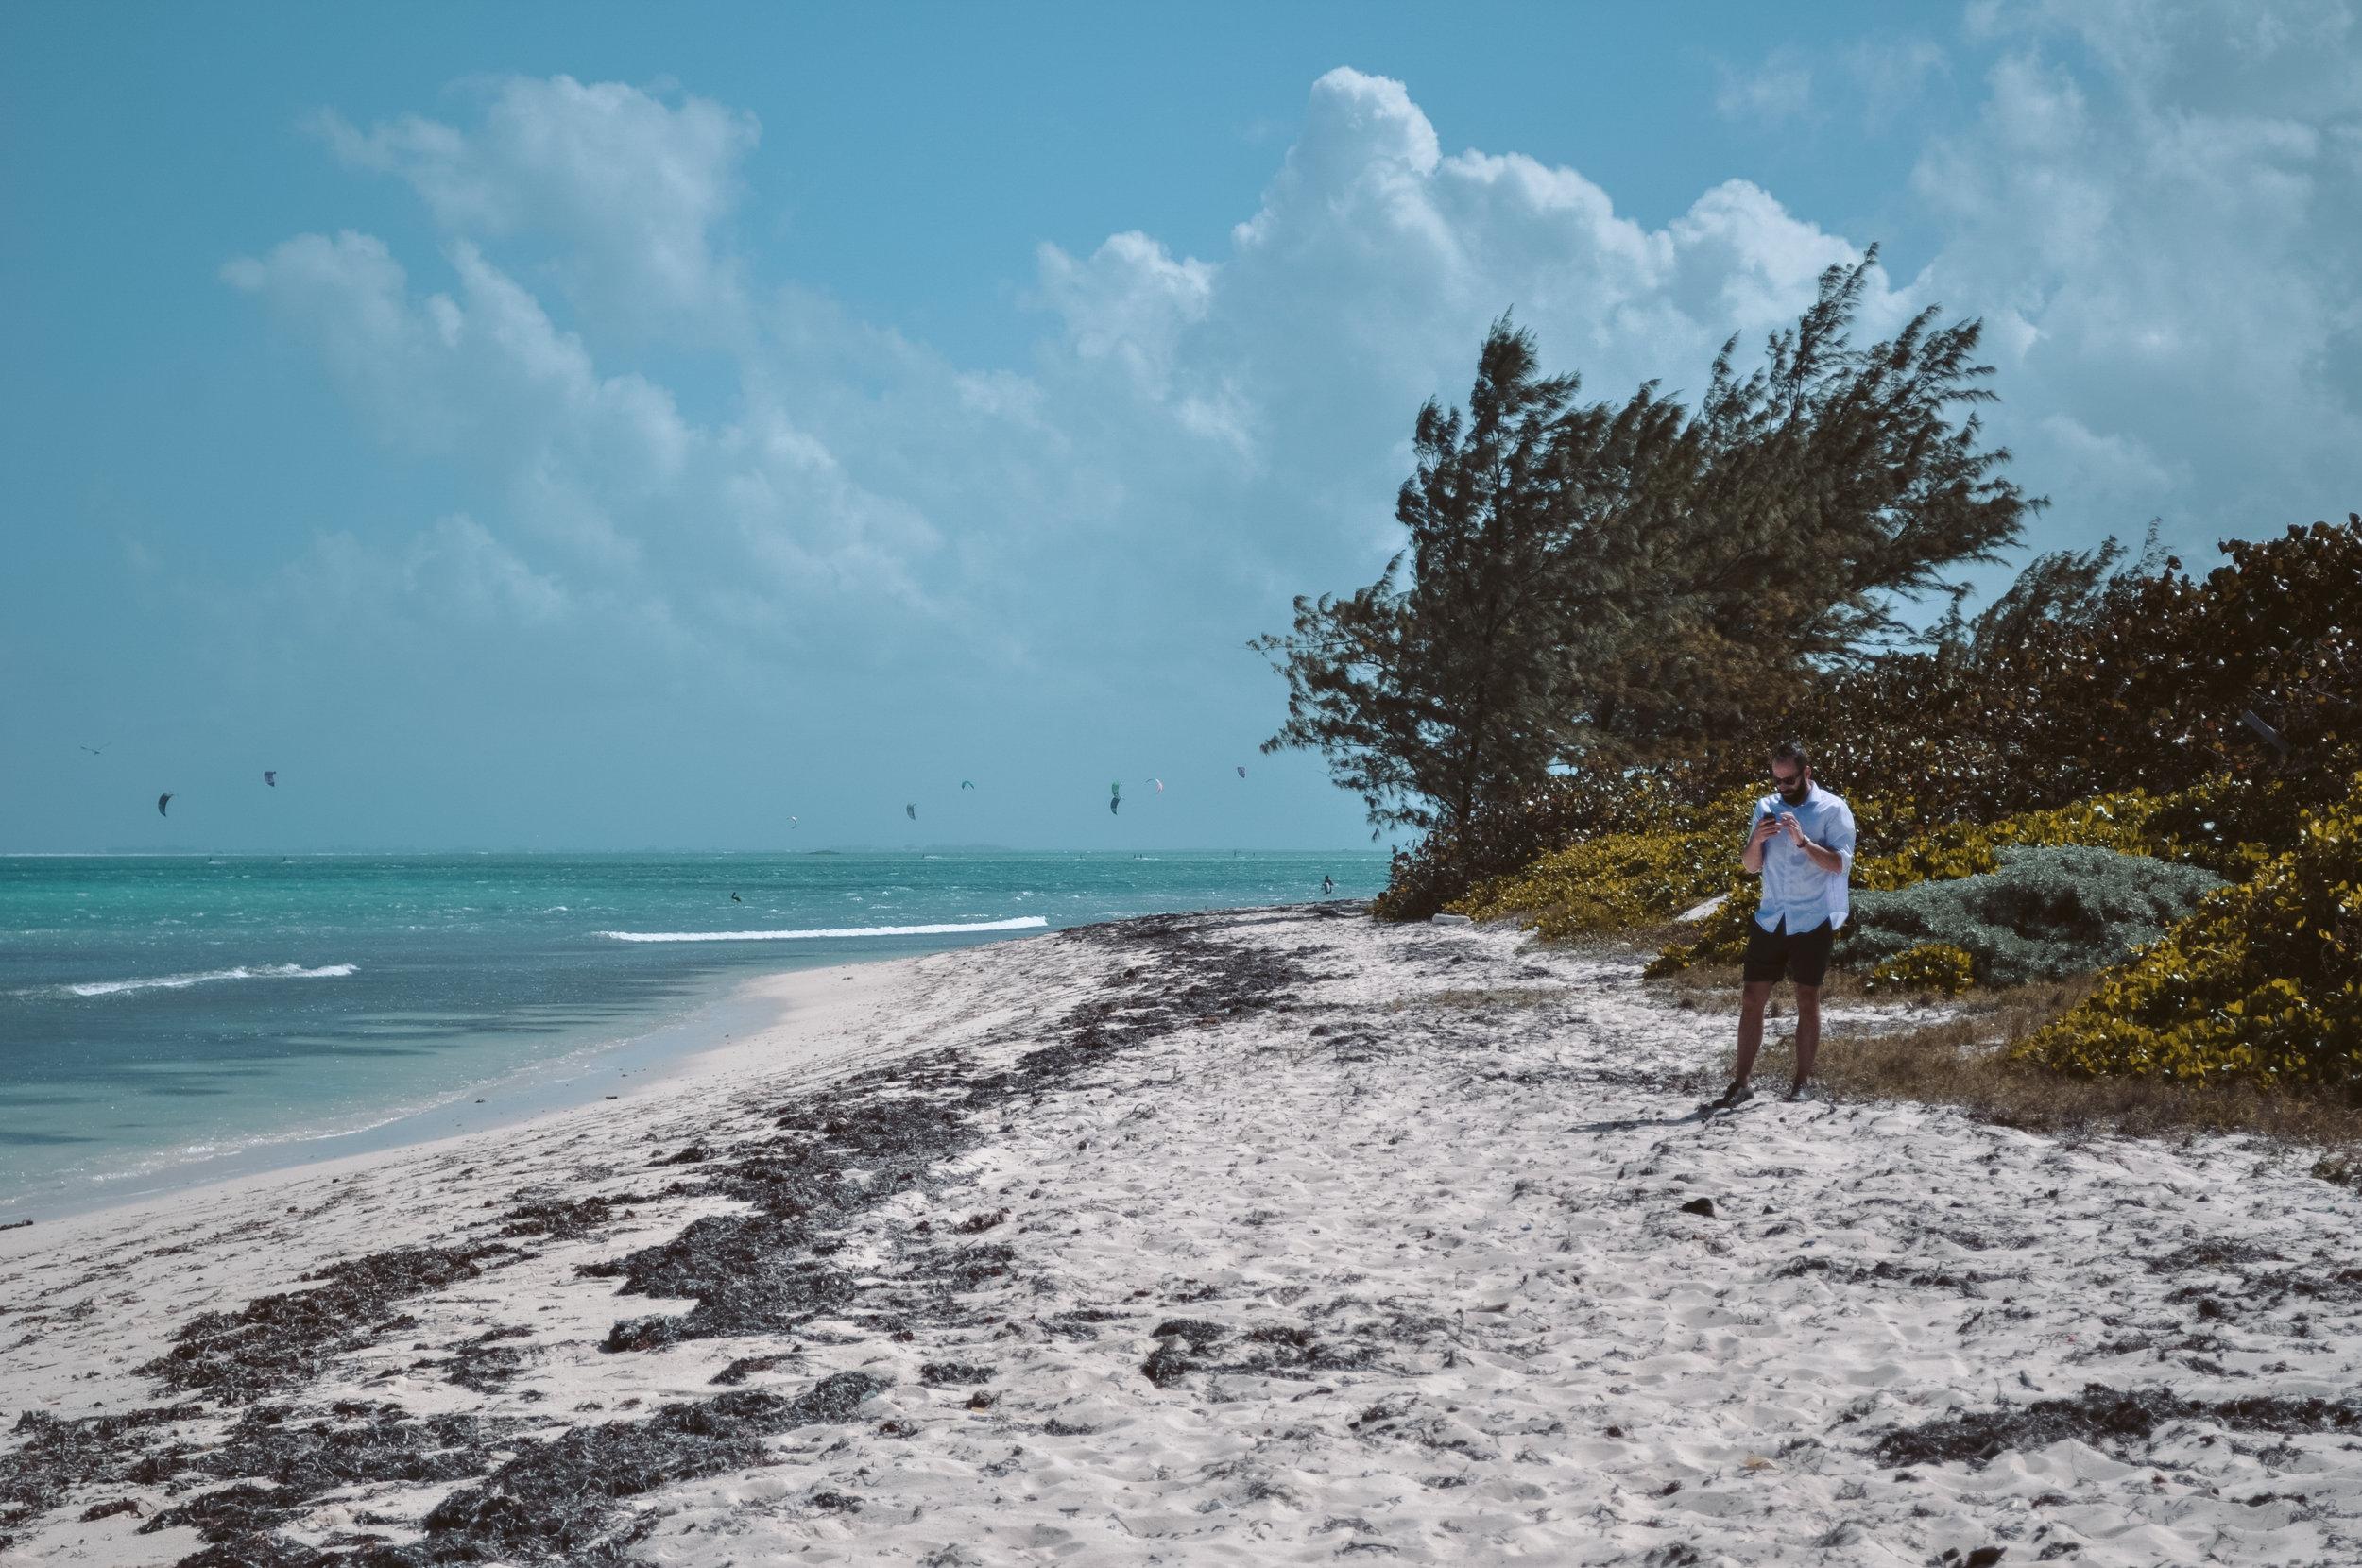 Cayman-01-11.jpg